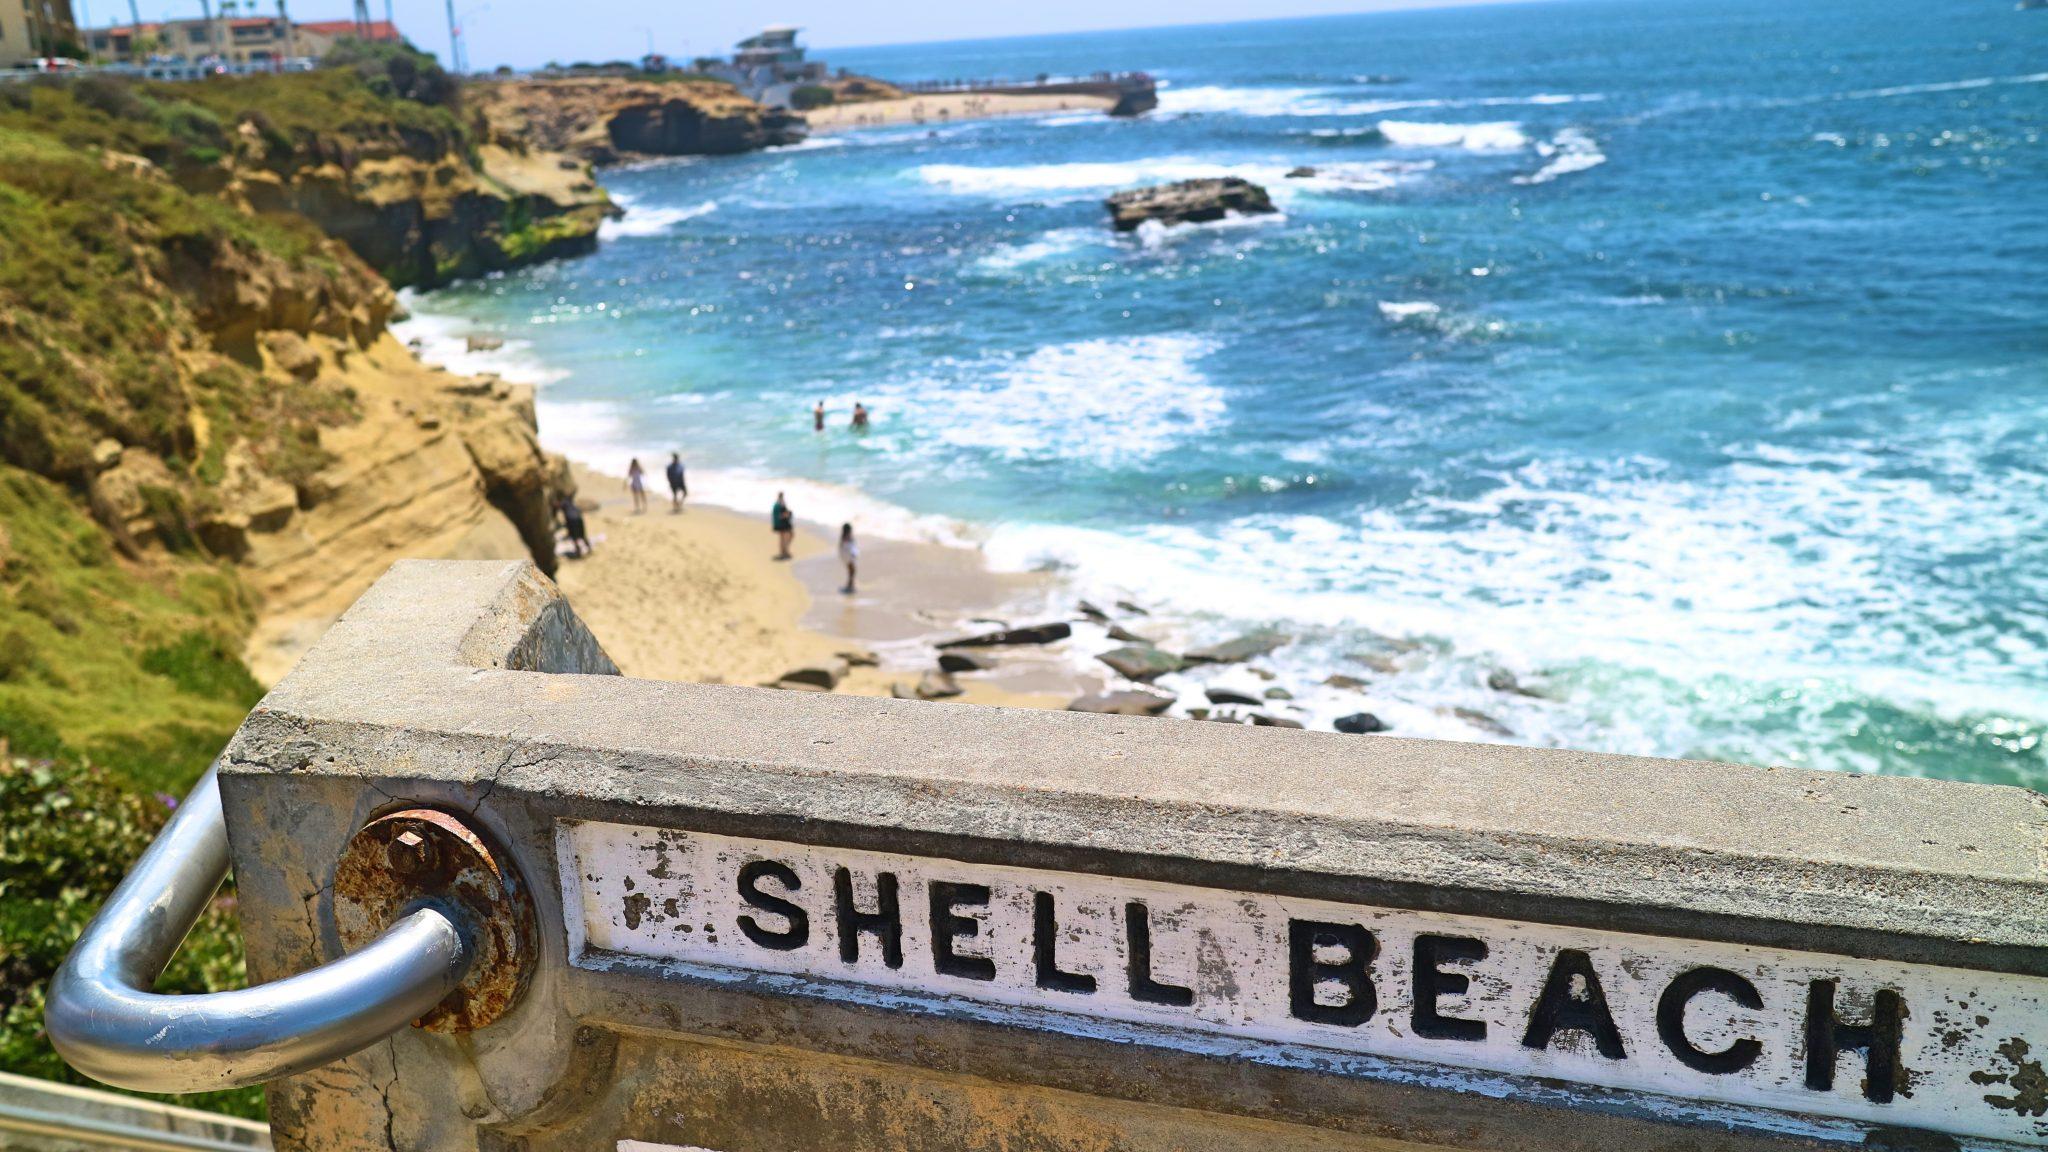 Shell Beach, La Jolla, California